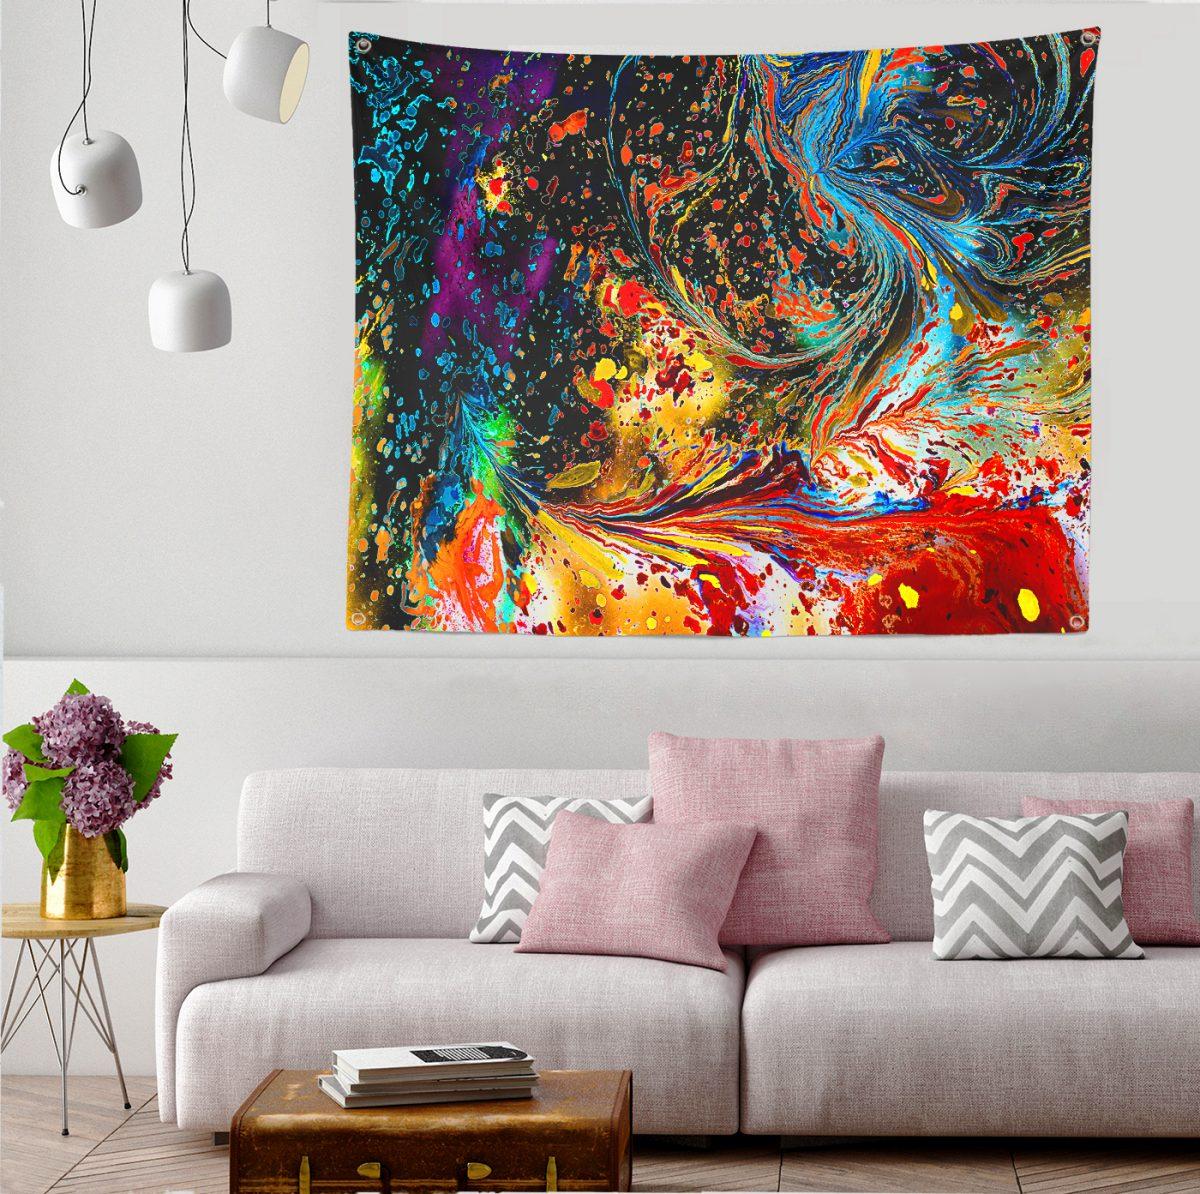 Sulu Boya Desenli Özel Tasarım Tapestry Duvar Örtüsü Realhomes